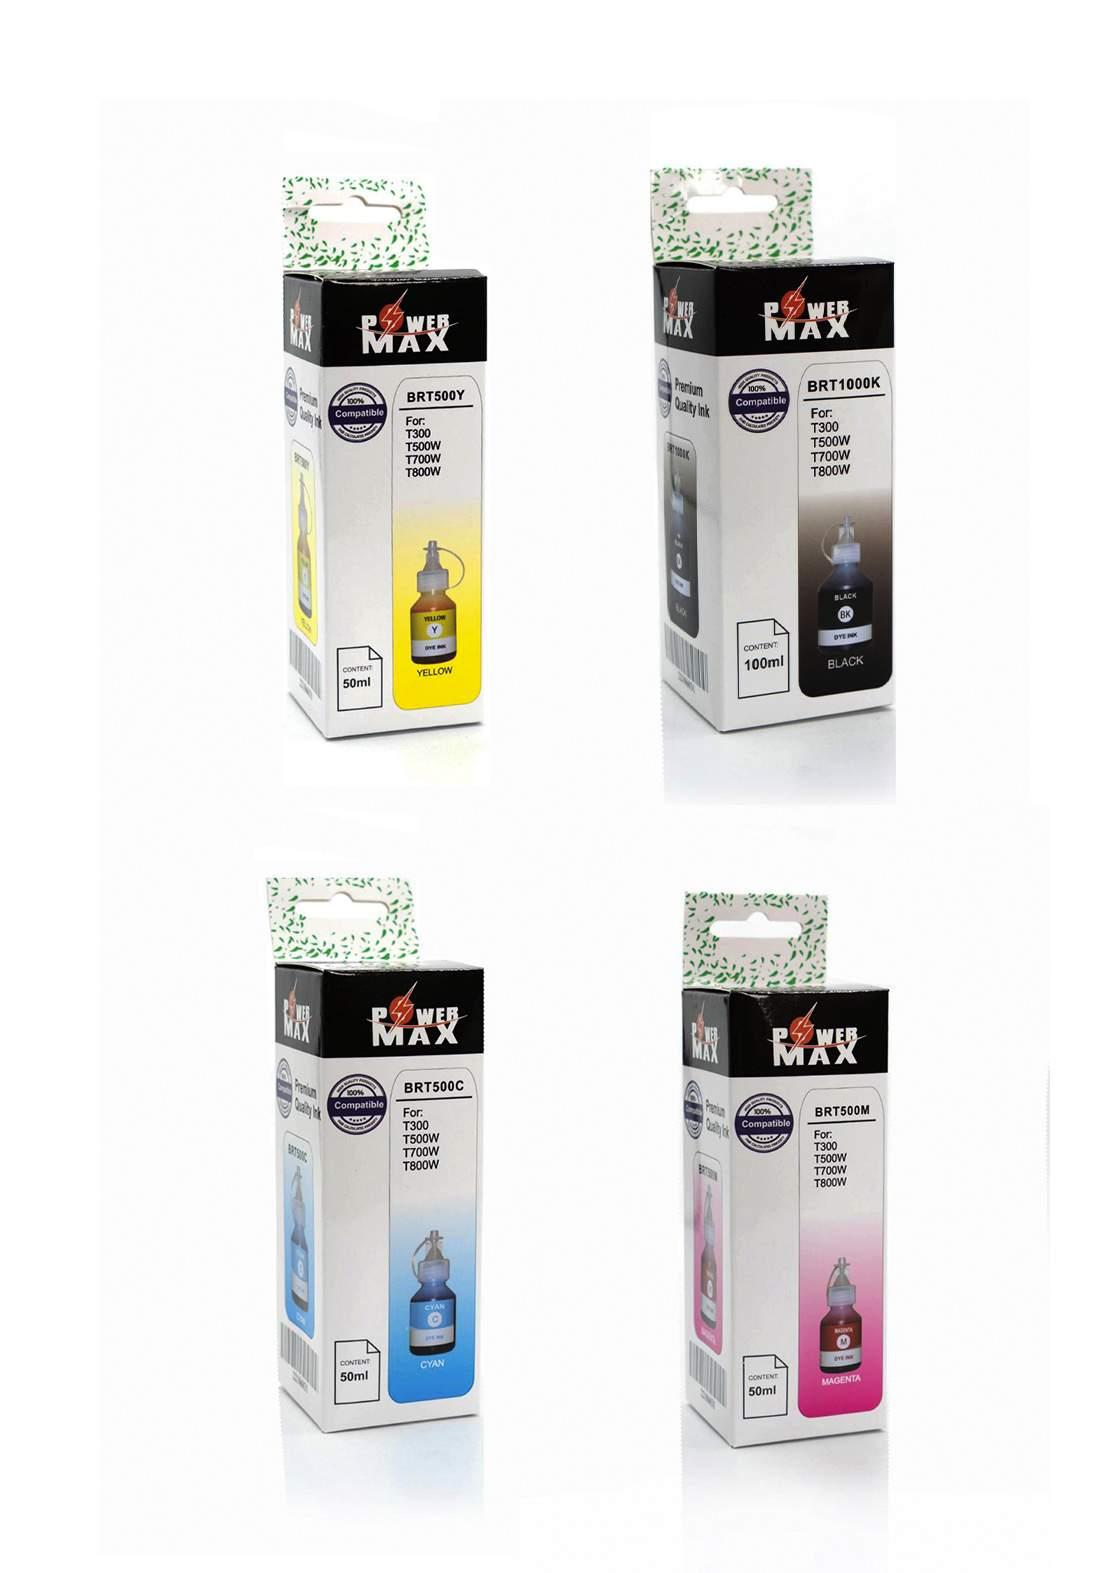 Power Max Brother T-Series Refill  INK Bottle Set سيت علب حبر